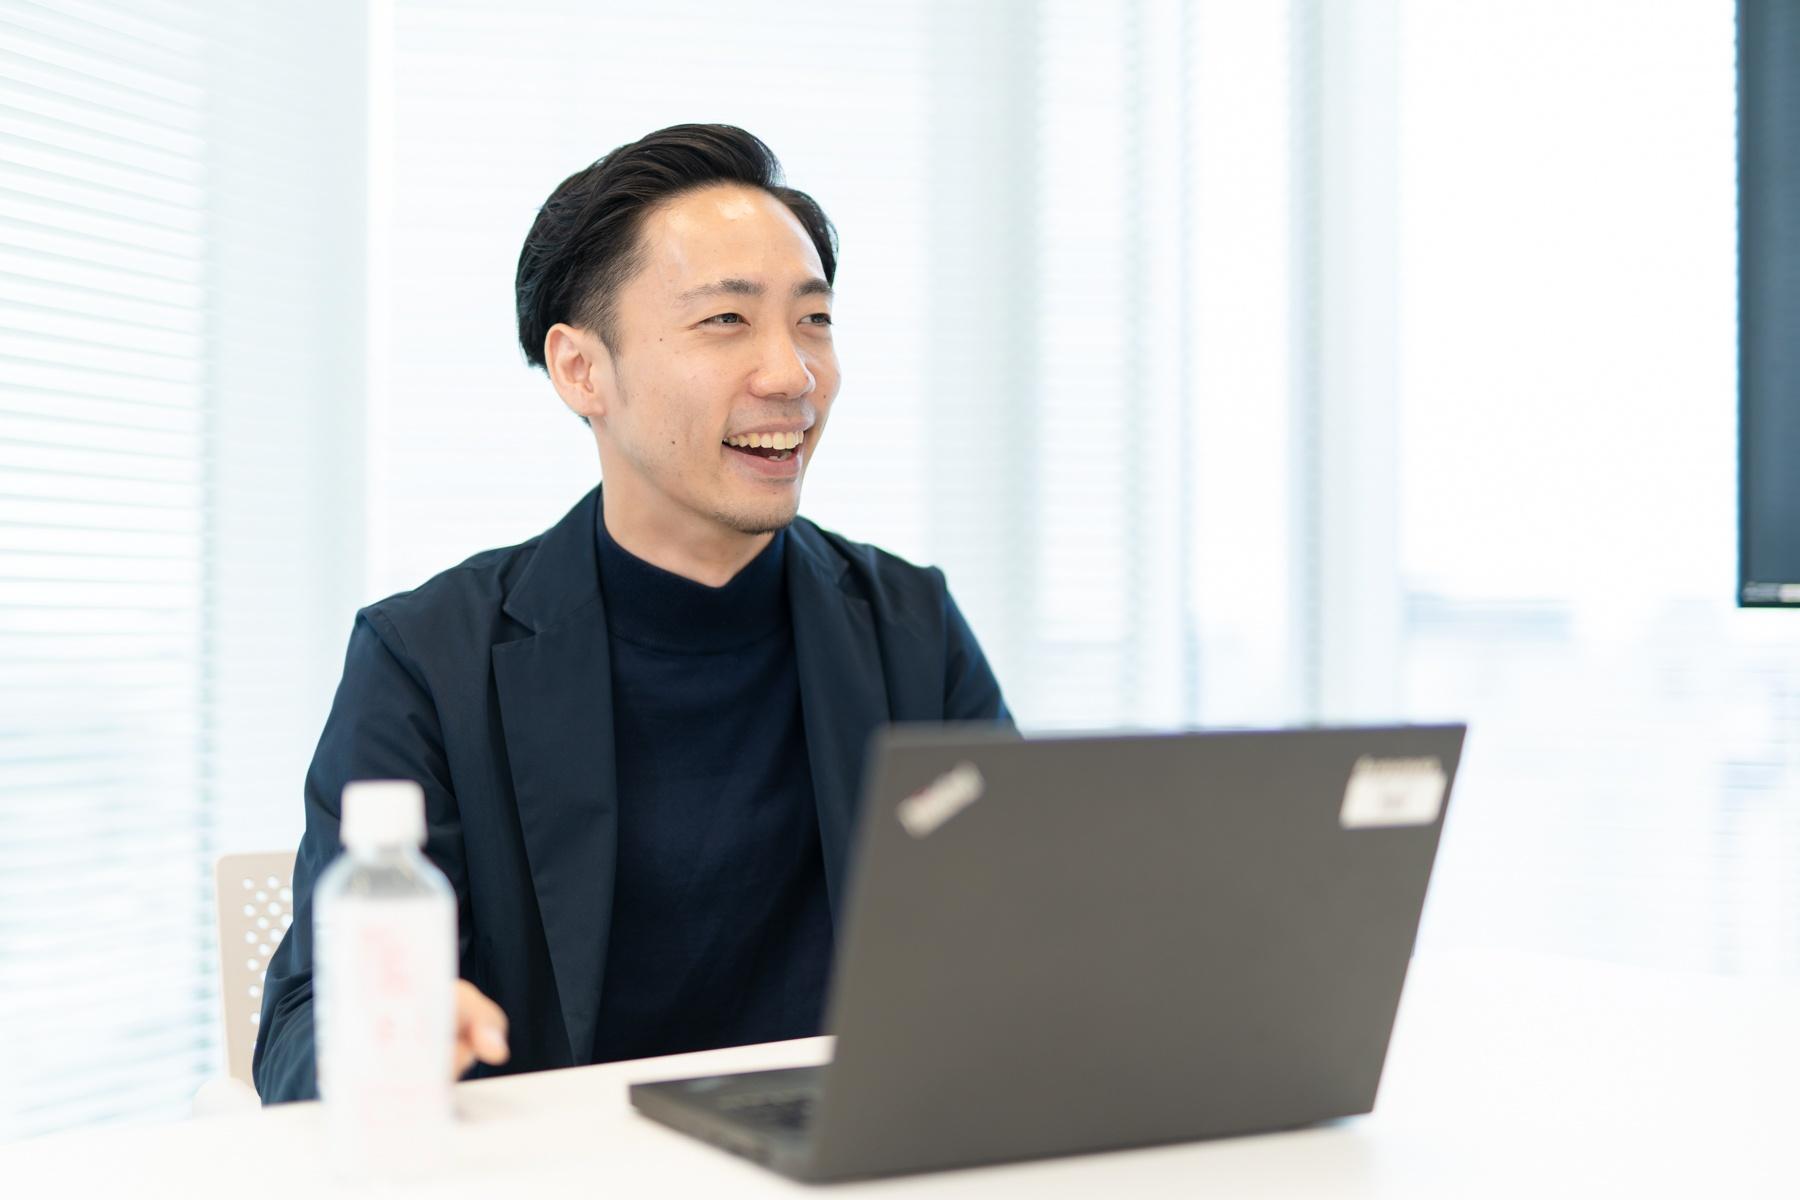 HITO-Linkサービス事業責任者 河内佑介、伊藤羊一さんとの対談